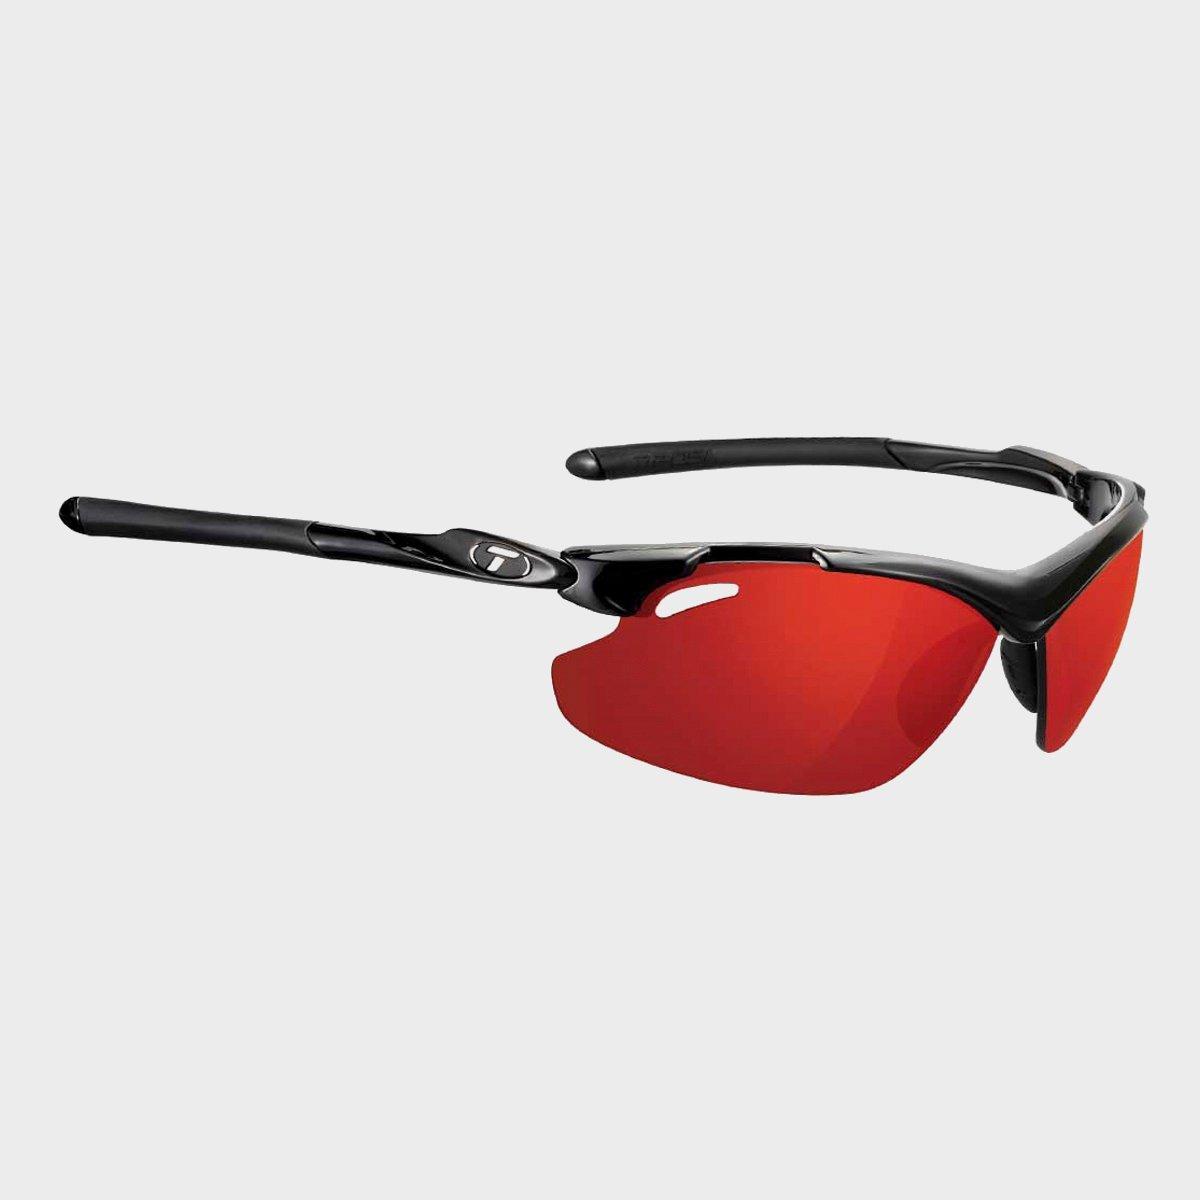 Tifosi Tifosi Tyrant 2.0 Sunglasses - Black, Black